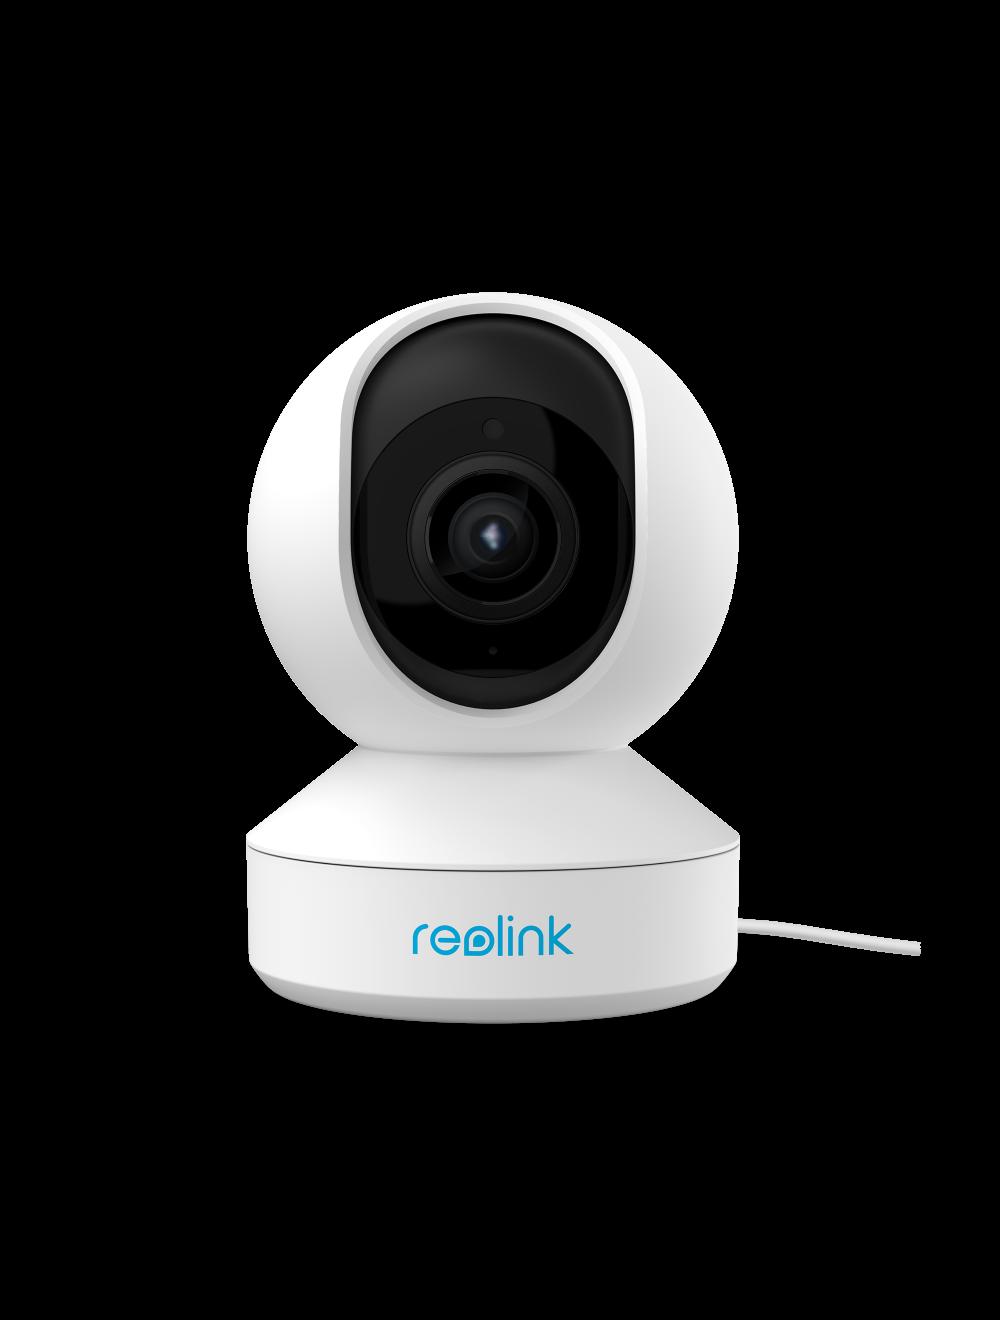 Reolink E1 Zoom | 5 Megapixel | Super HD | Dual Band | PTZ |